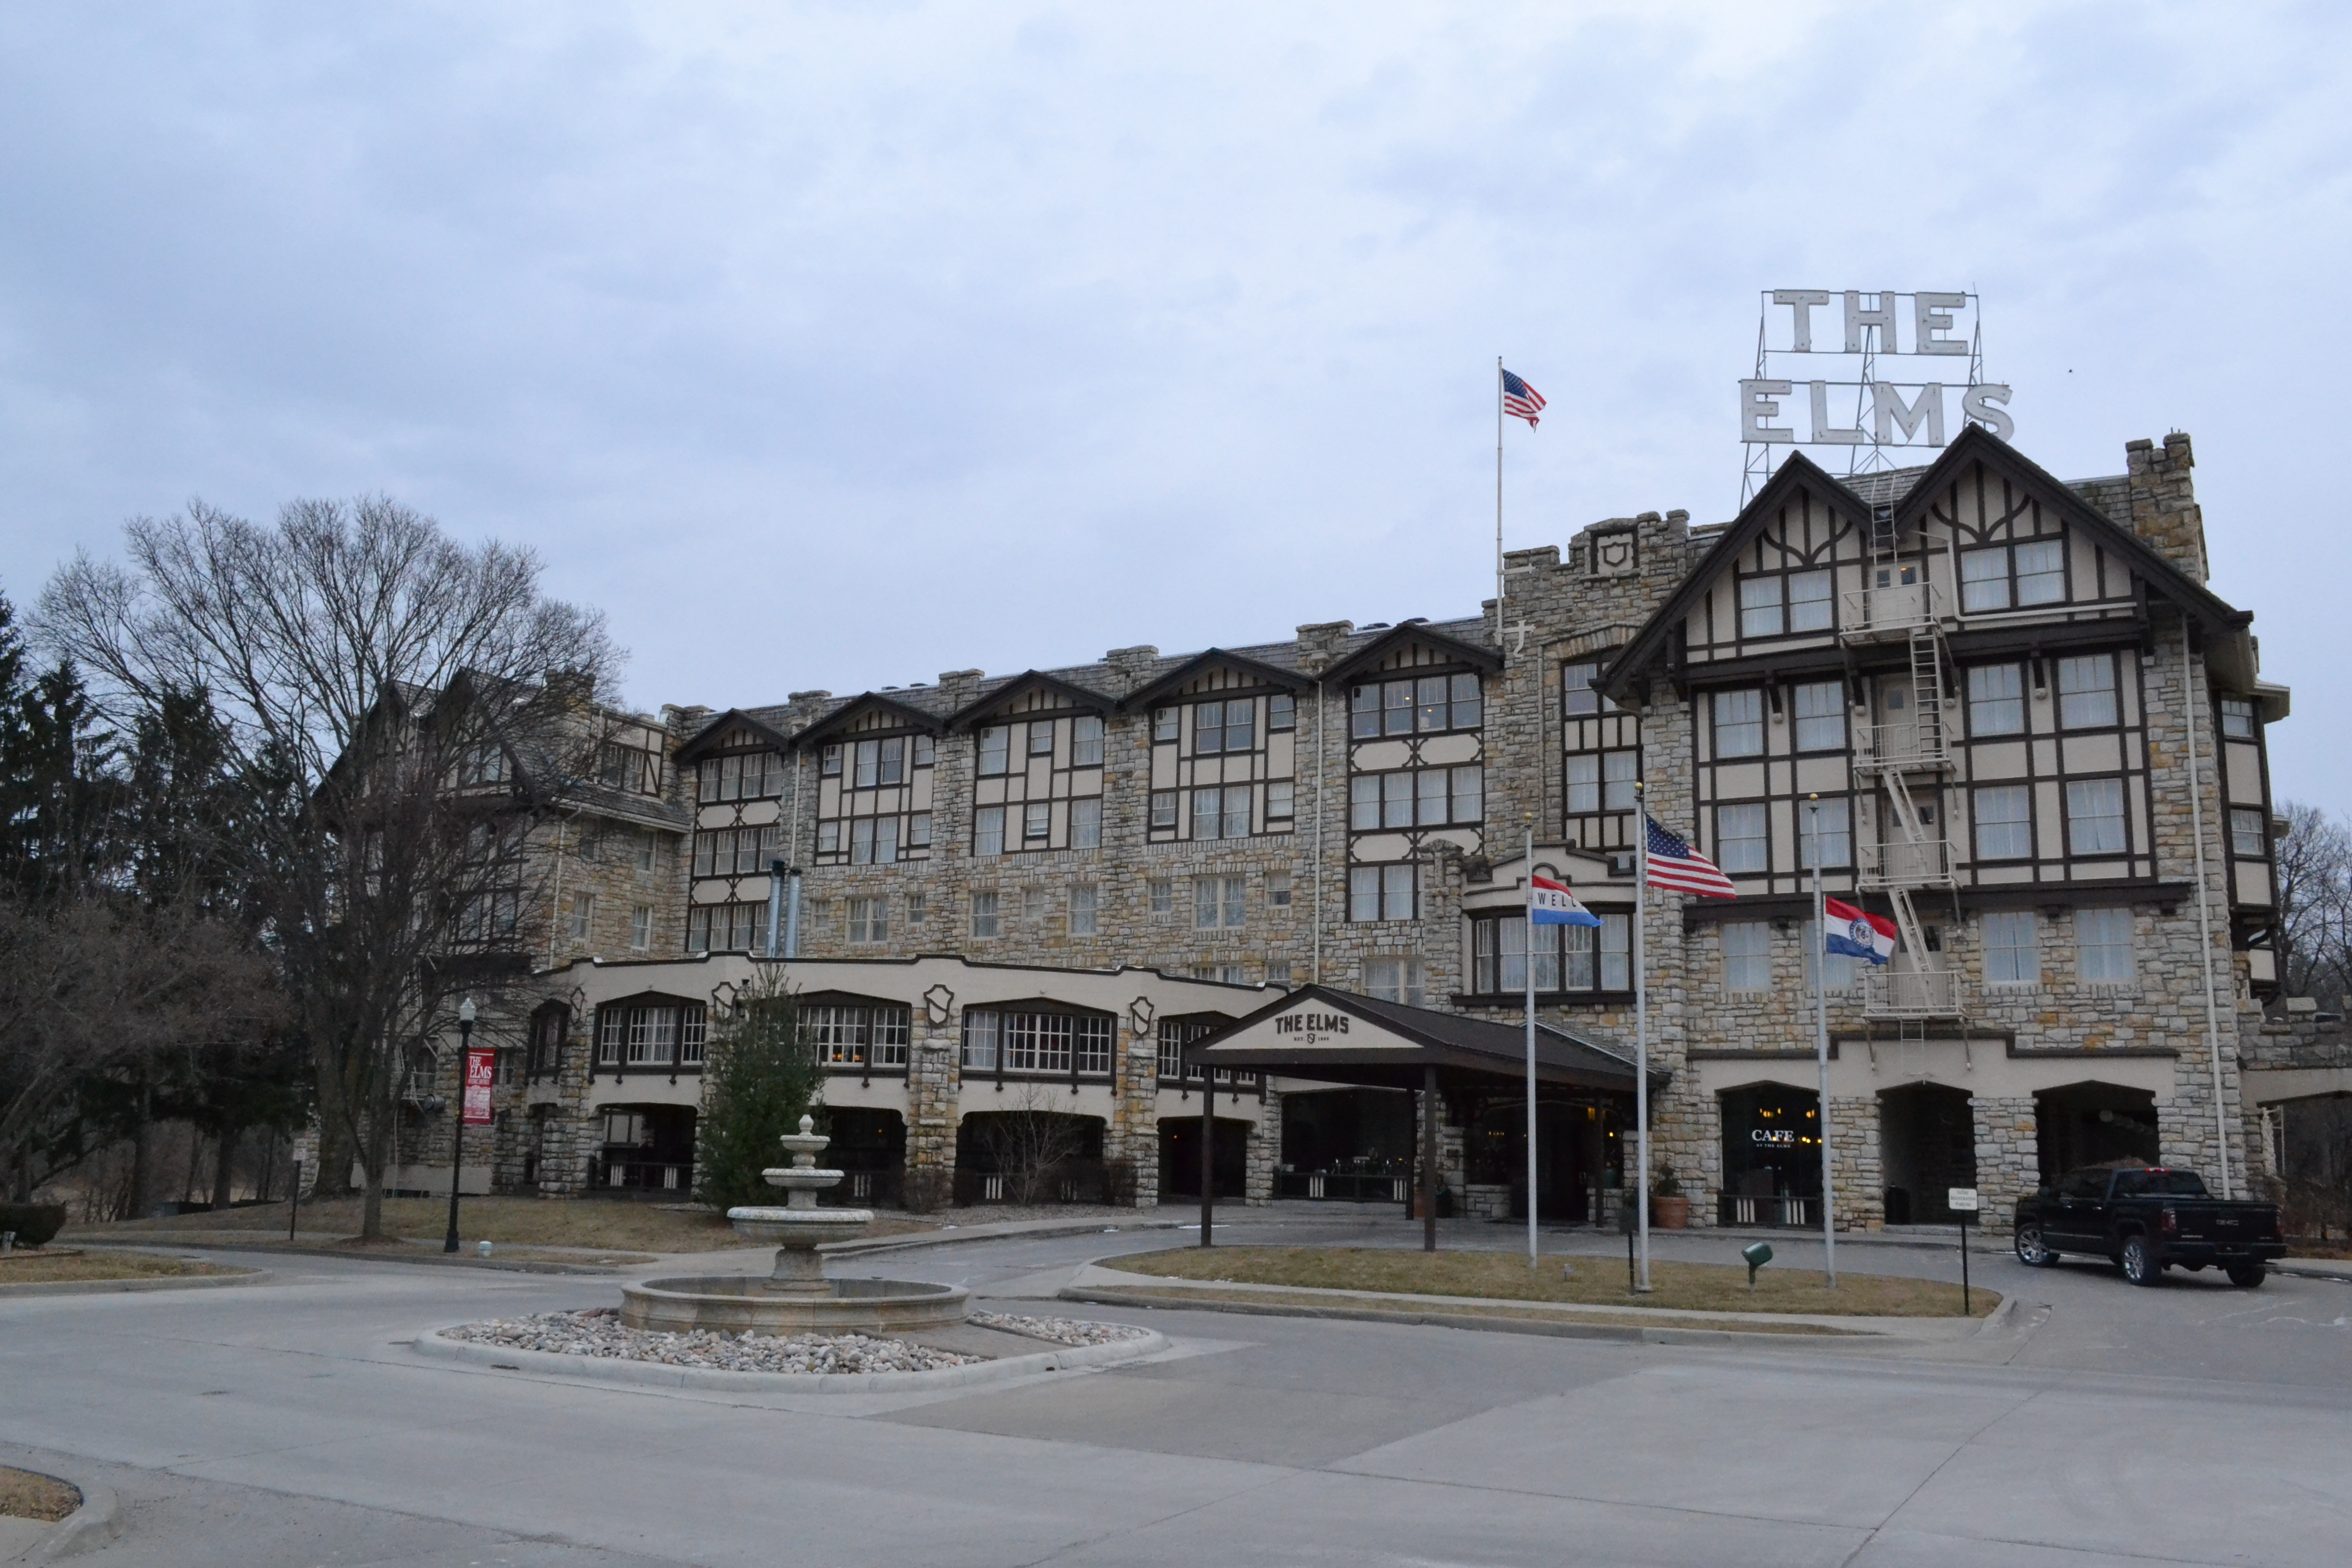 Sheraton-Elms Hotel Excelsior Springs, MO